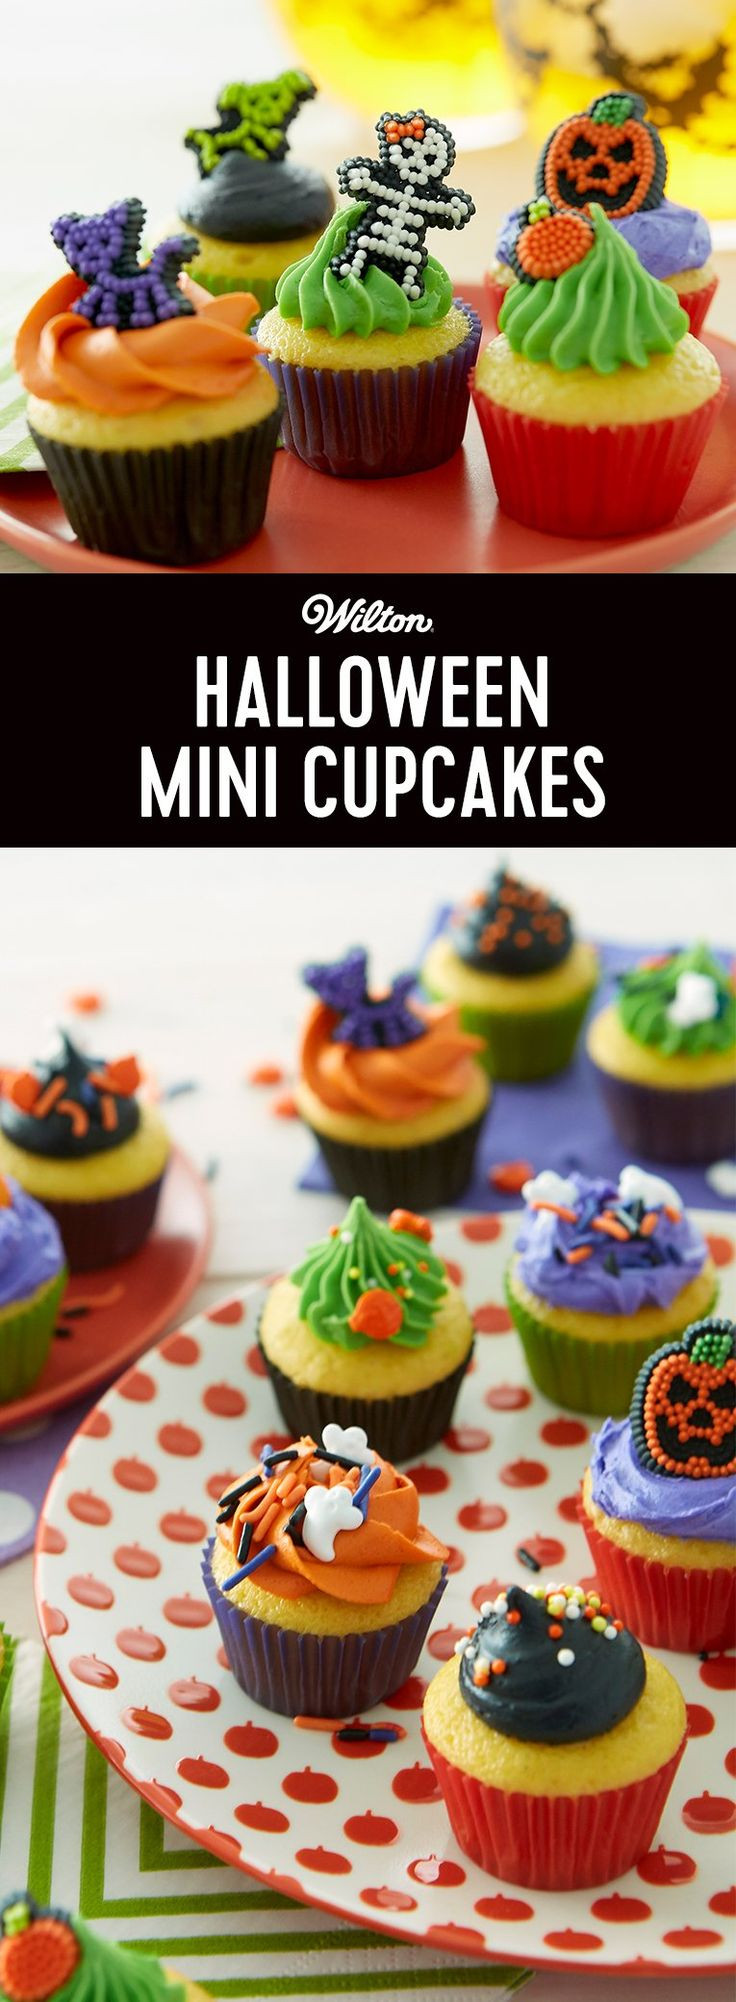 Halloween Mini Cupcakes  387 best Moore Wilton images on Pinterest